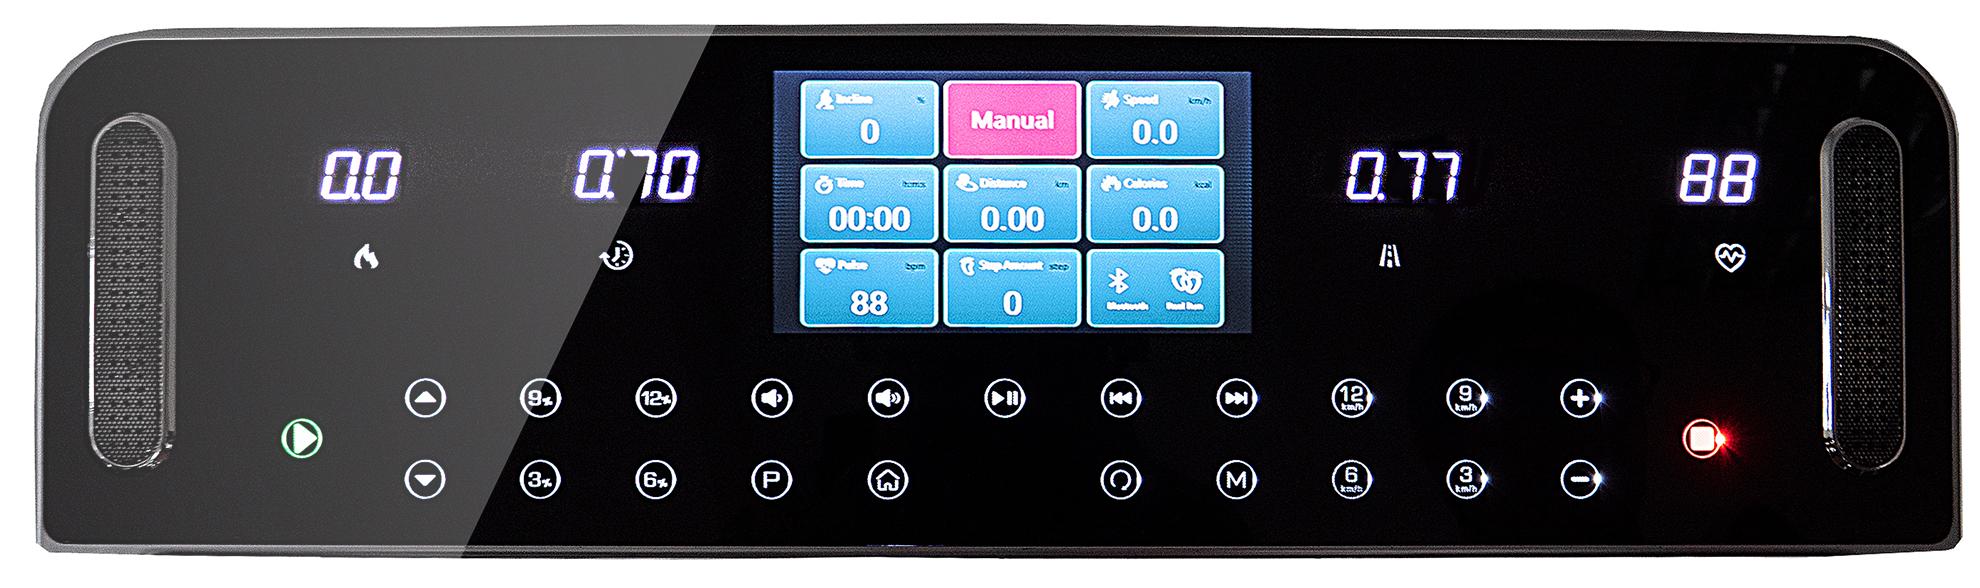 Laufband TM 5000S